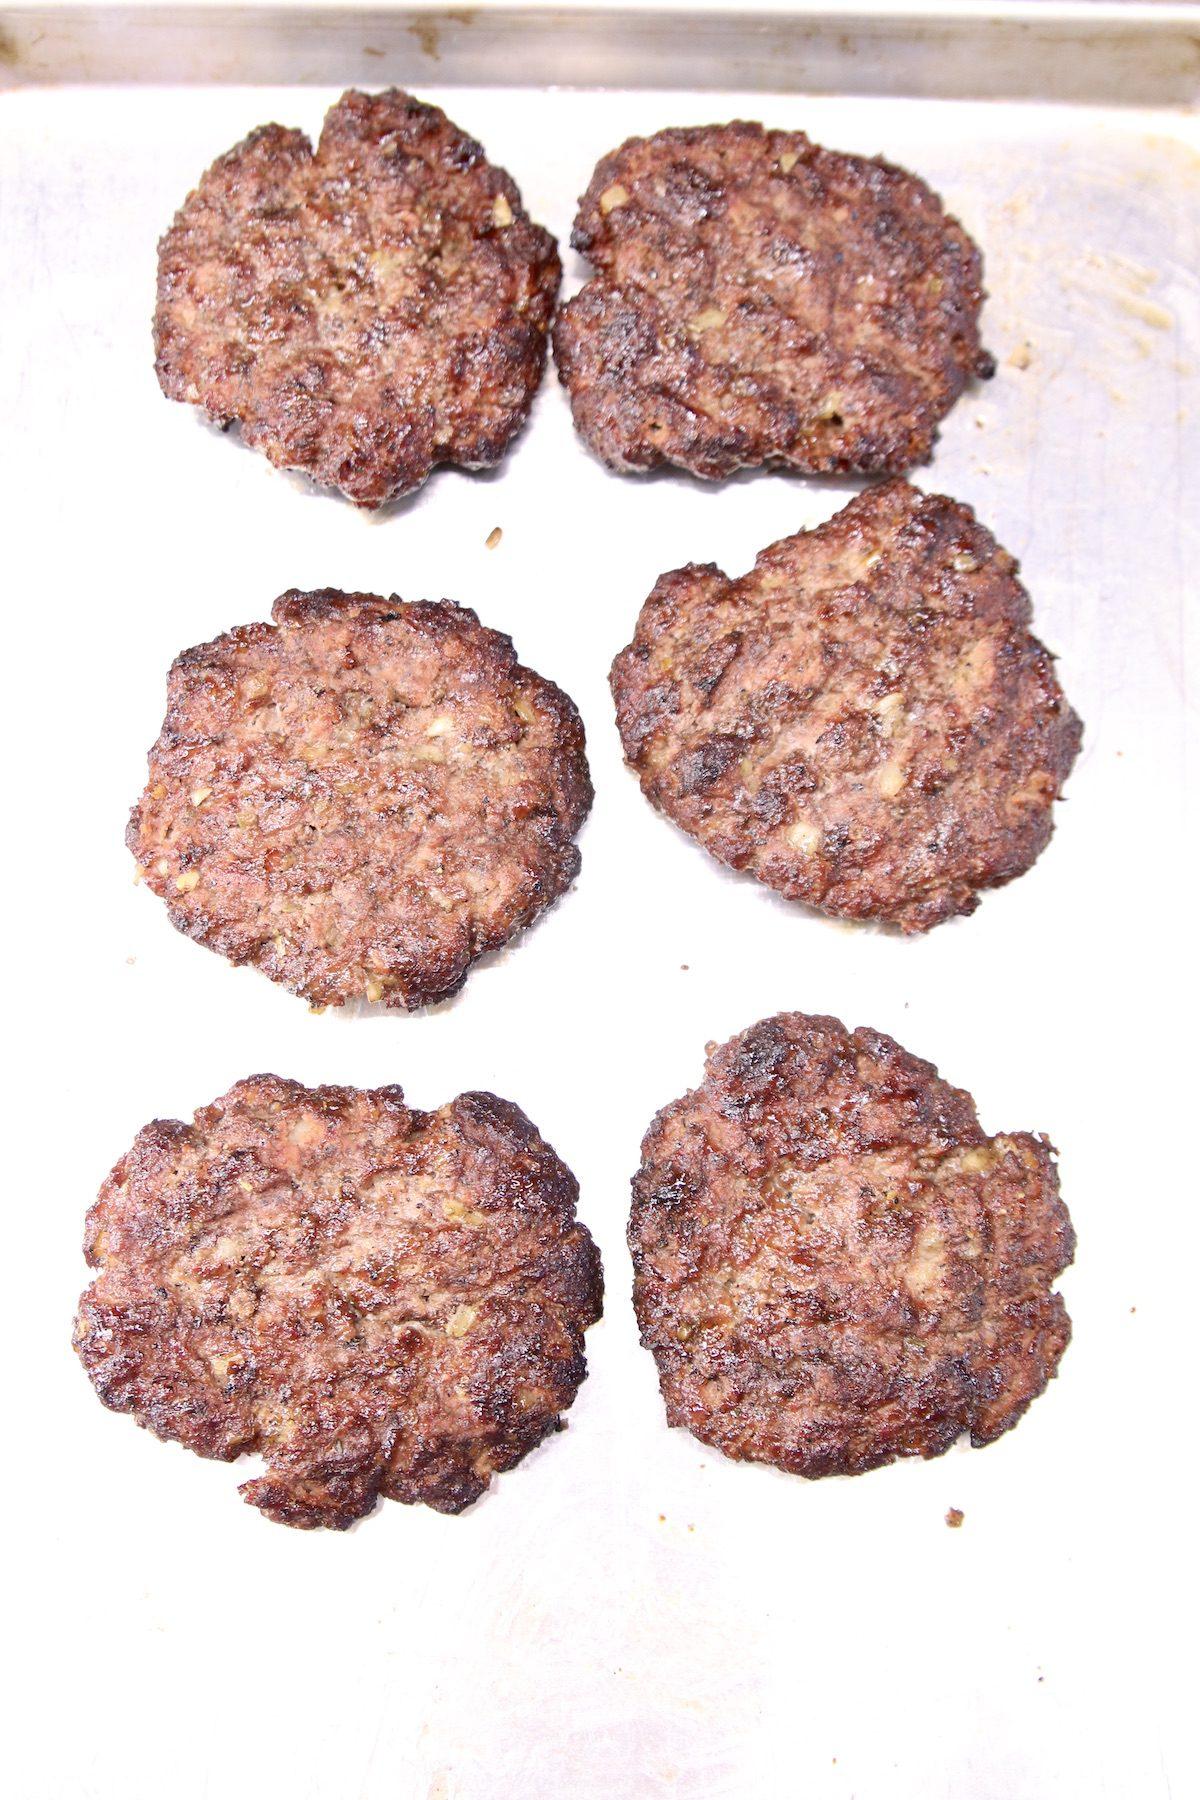 6 grilled burger patties on a sheet pan